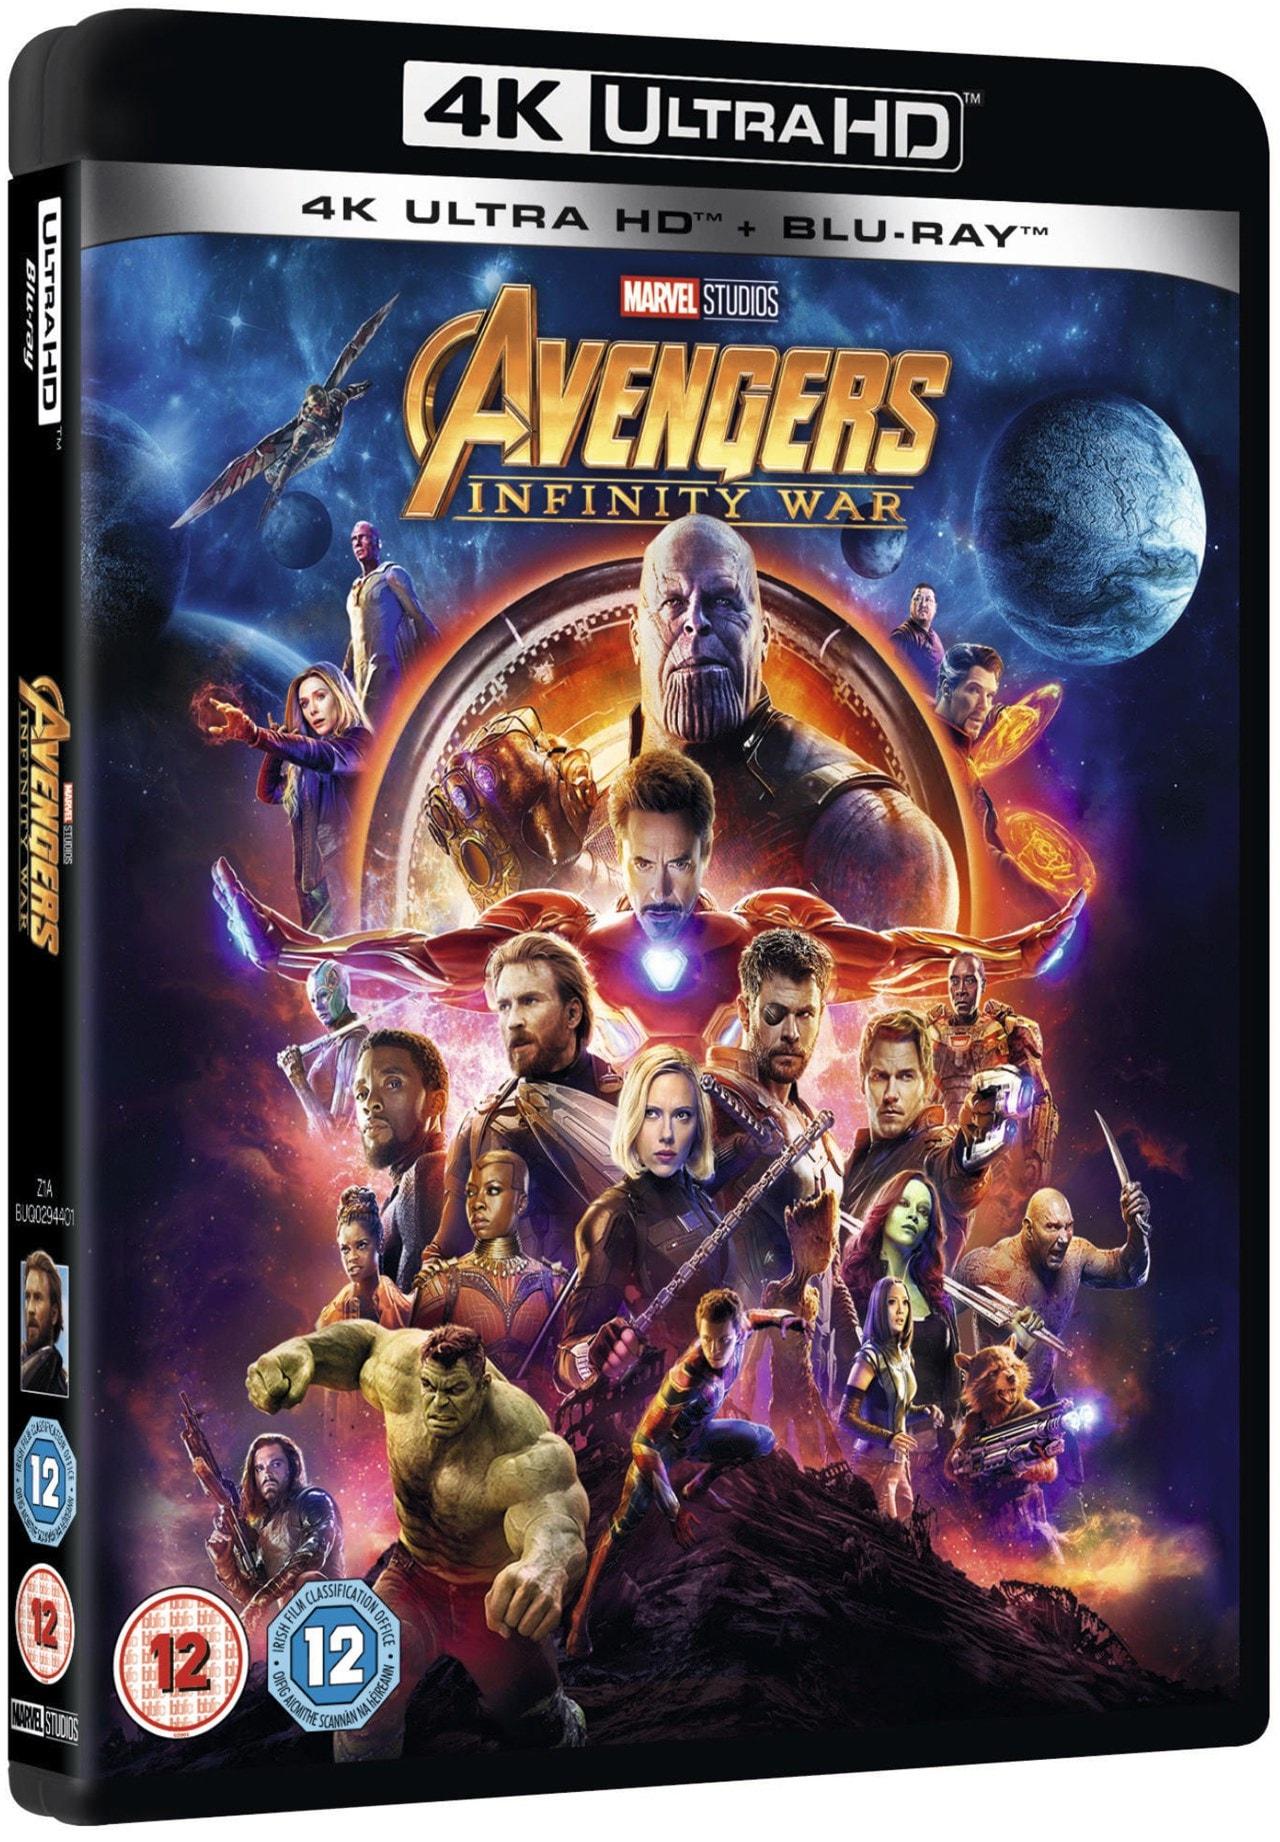 Avengers: Infinity War - 4